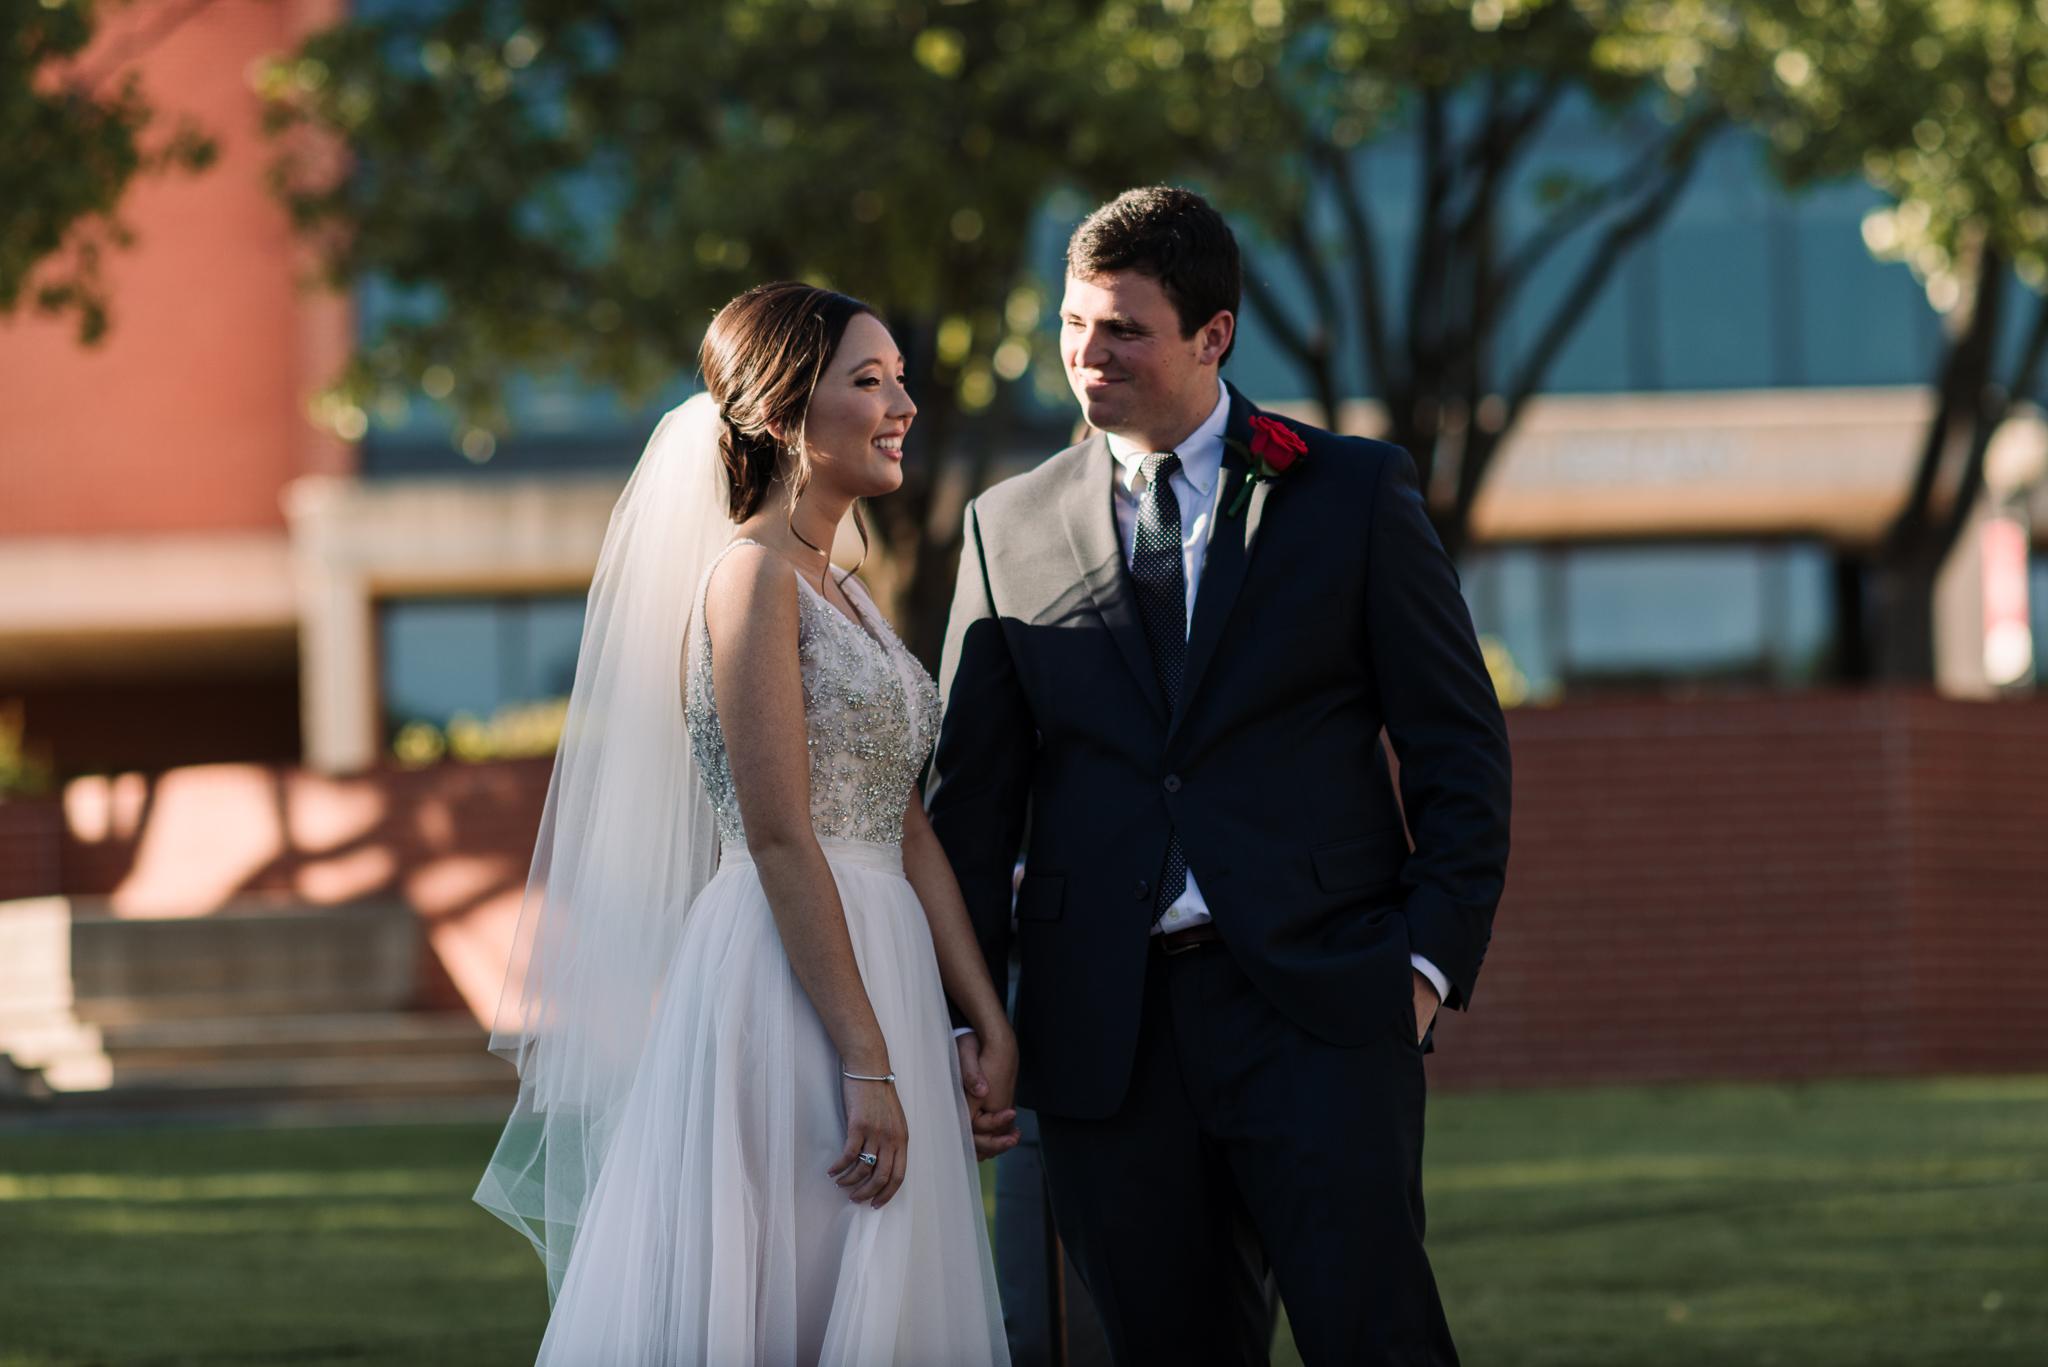 Oklahoma-Christian-University-Wedding-0380.jpg